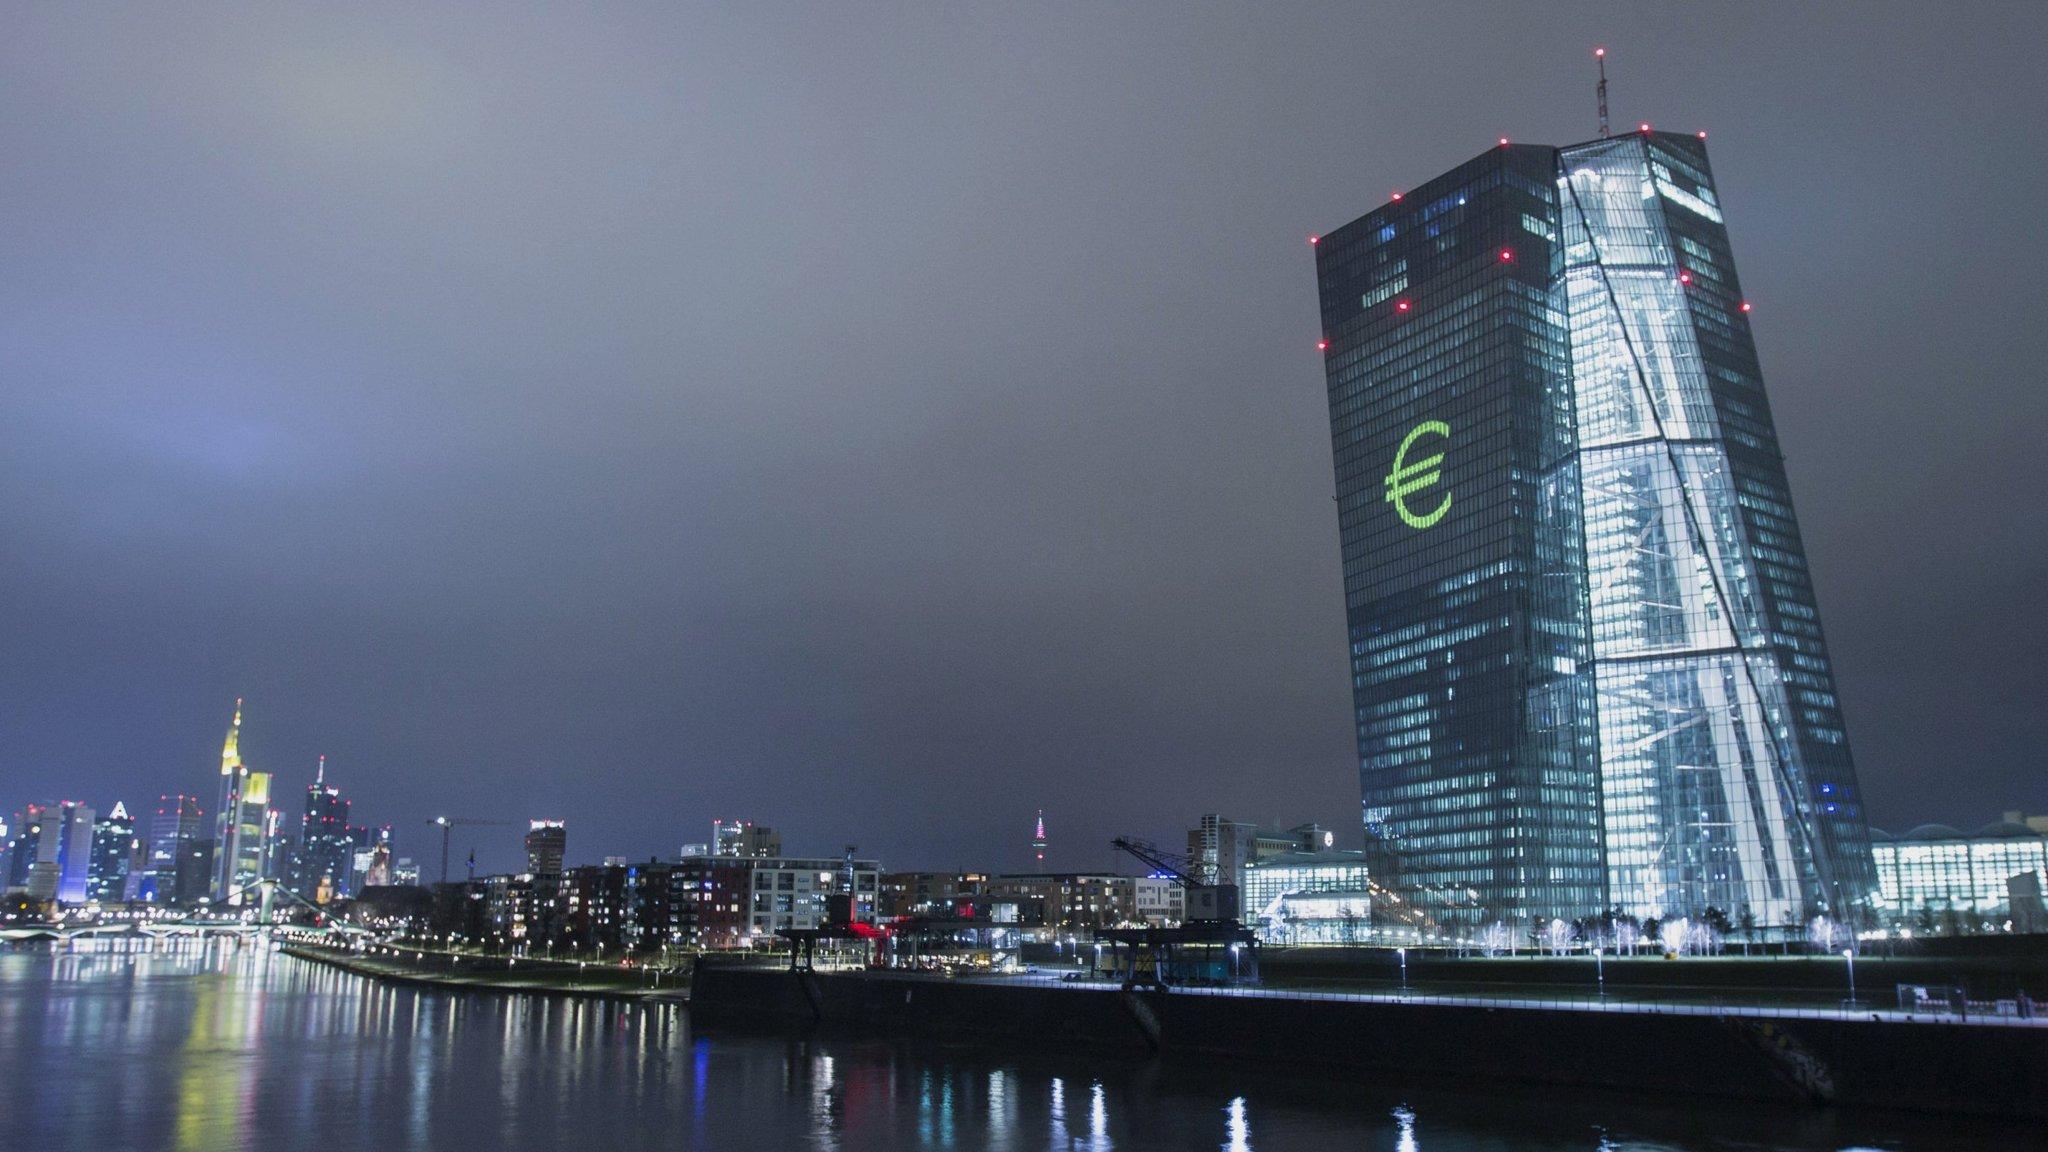 who controls the european central bank